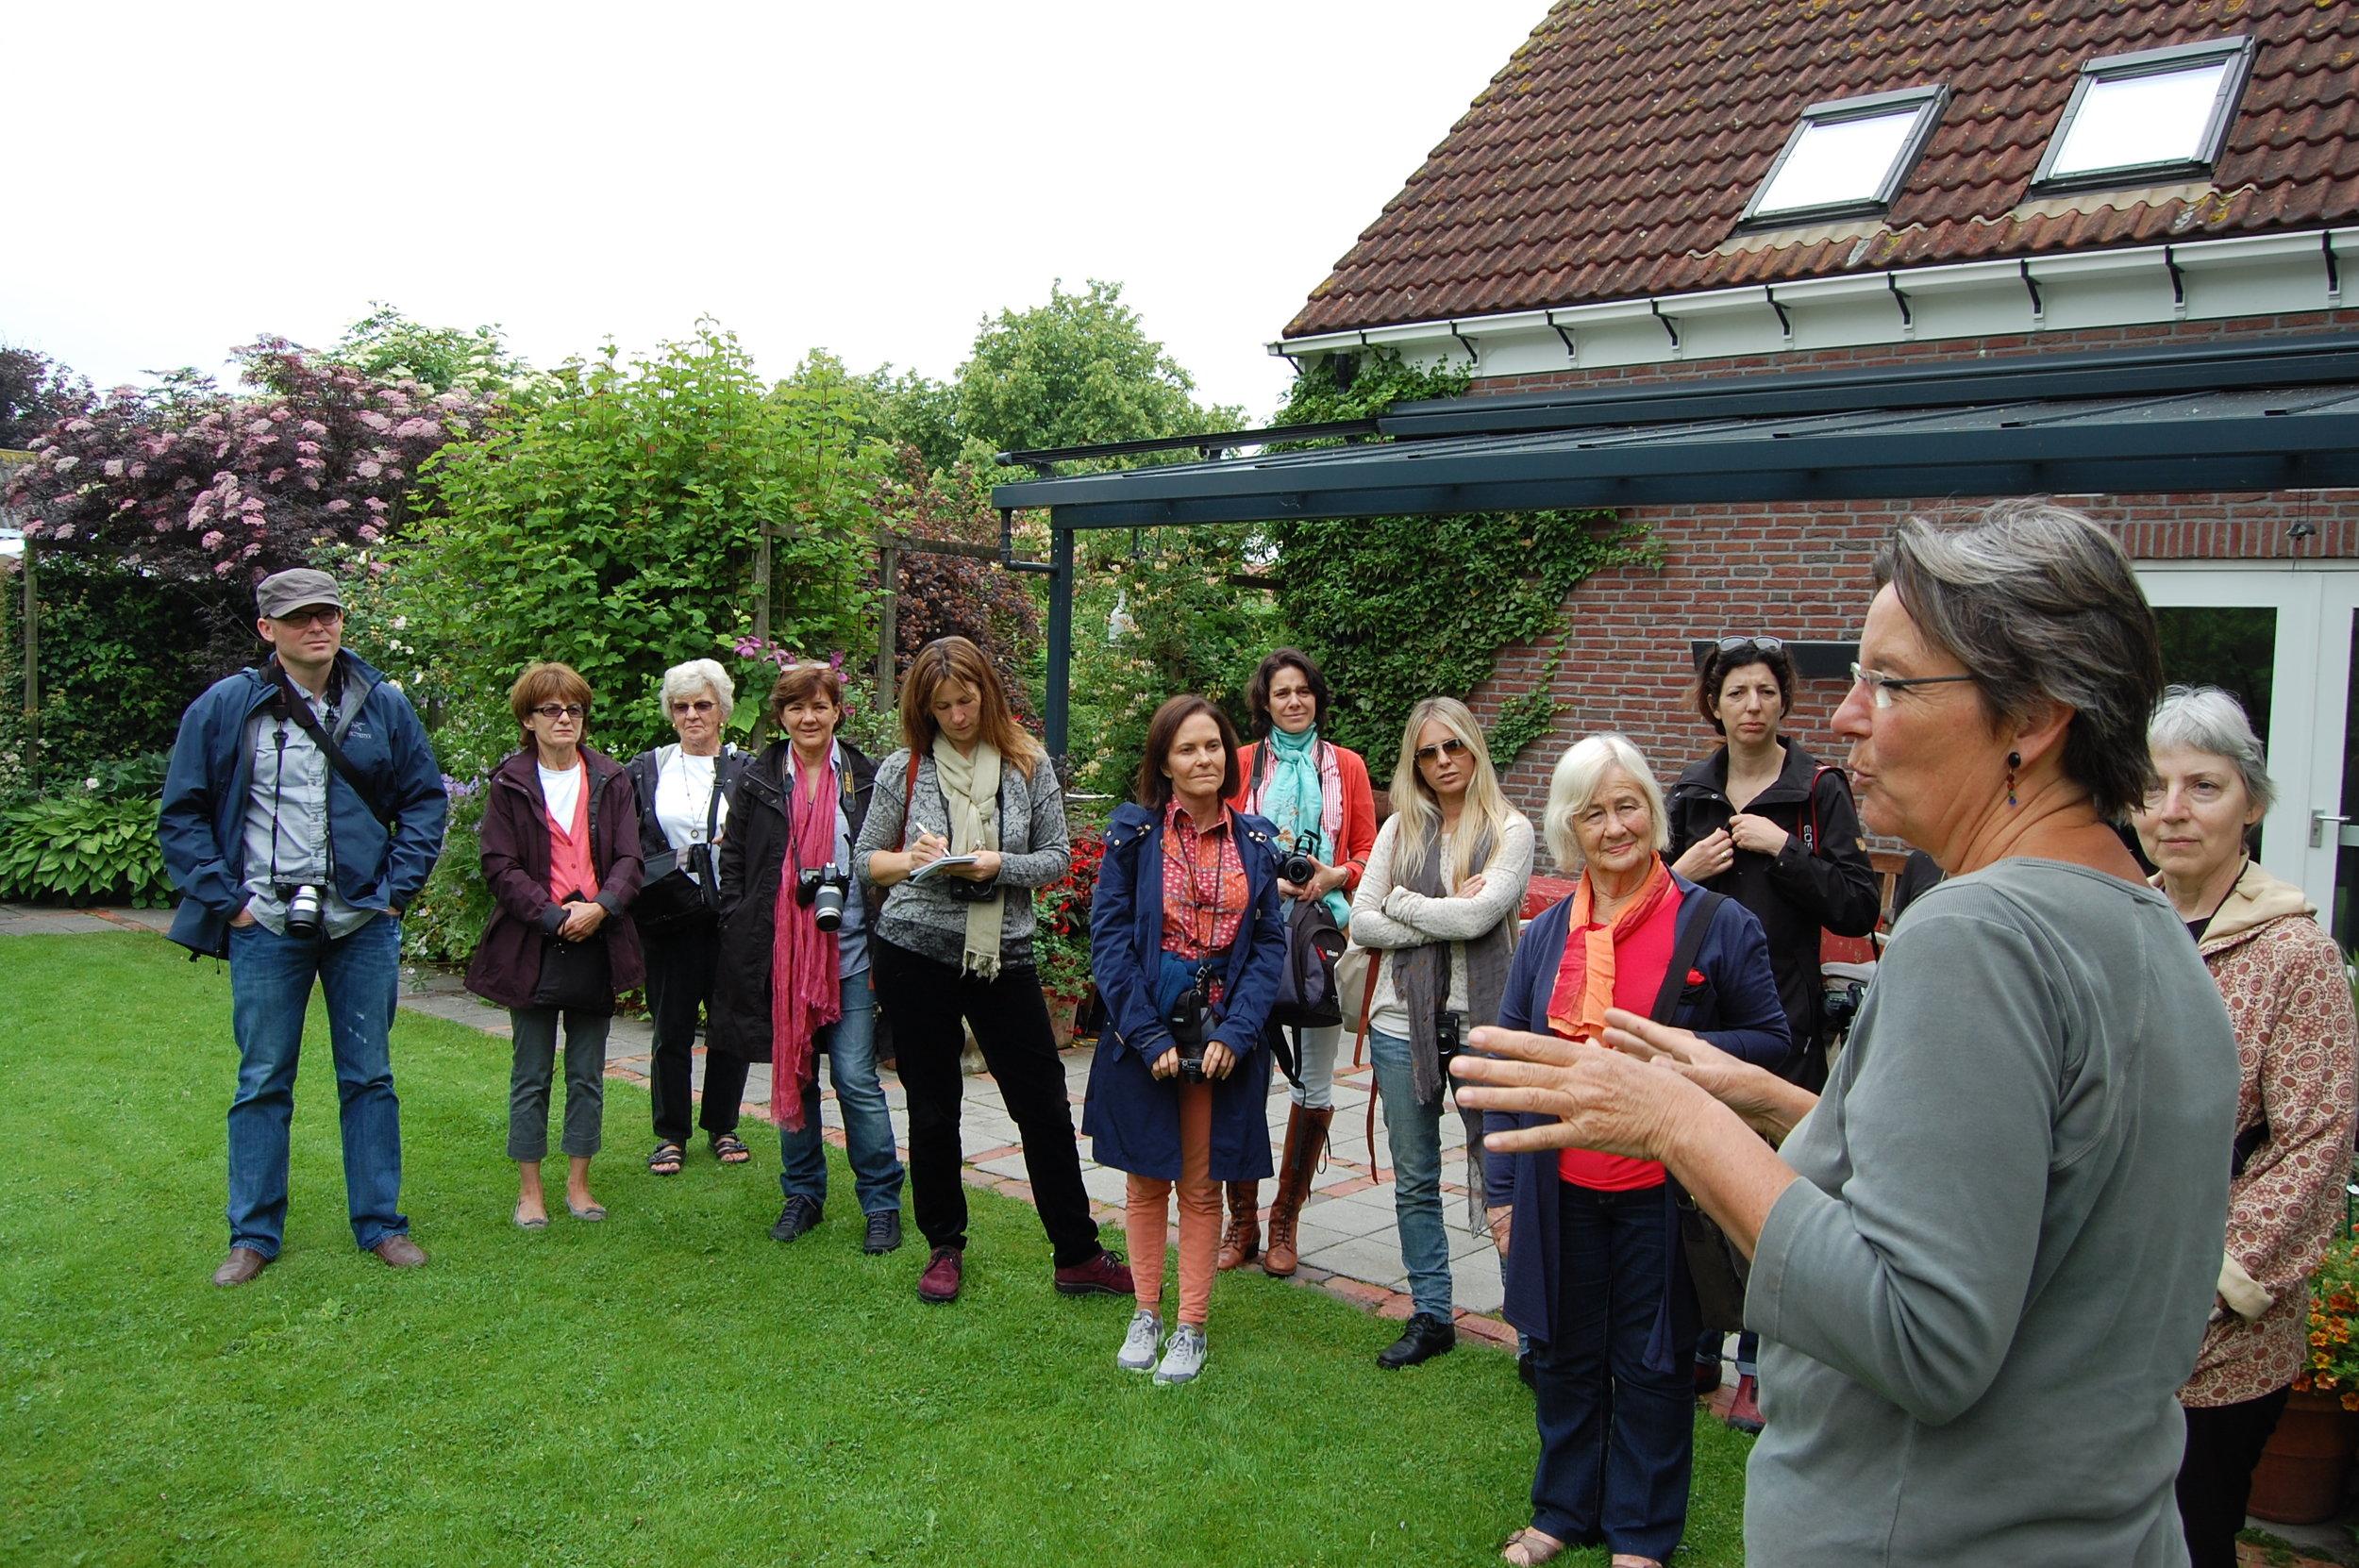 Com las Chicas Argentinas, at de Kleine Plantage, Groningen, northern Netherlands, 2013